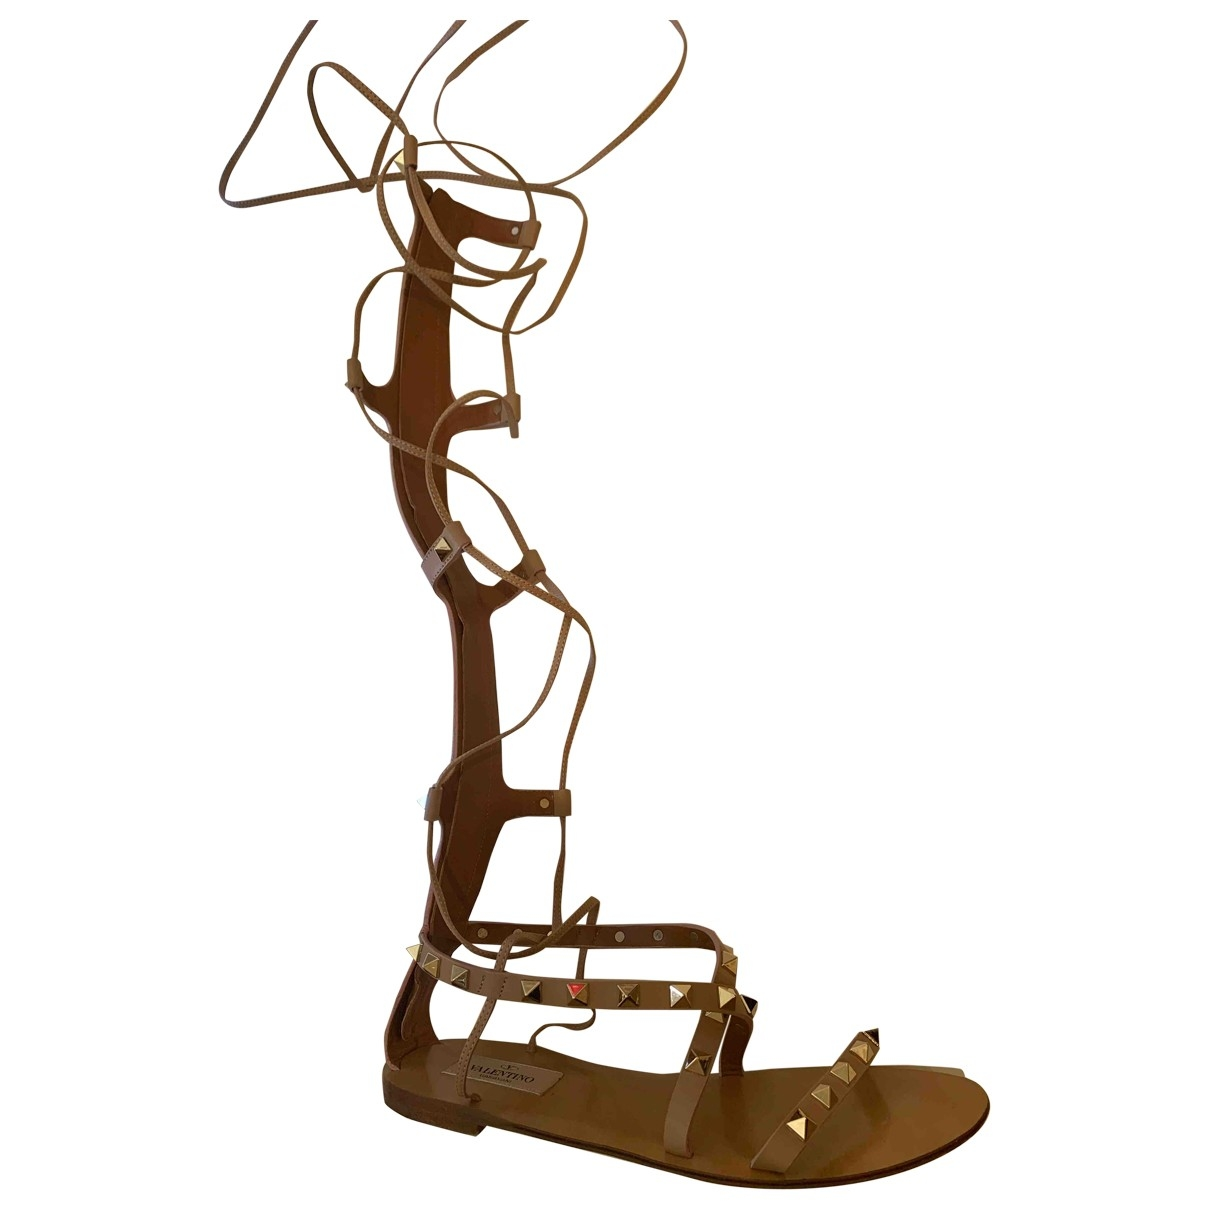 Valentino Garavani Rockstud Beige Leather Sandals for Women 36 EU